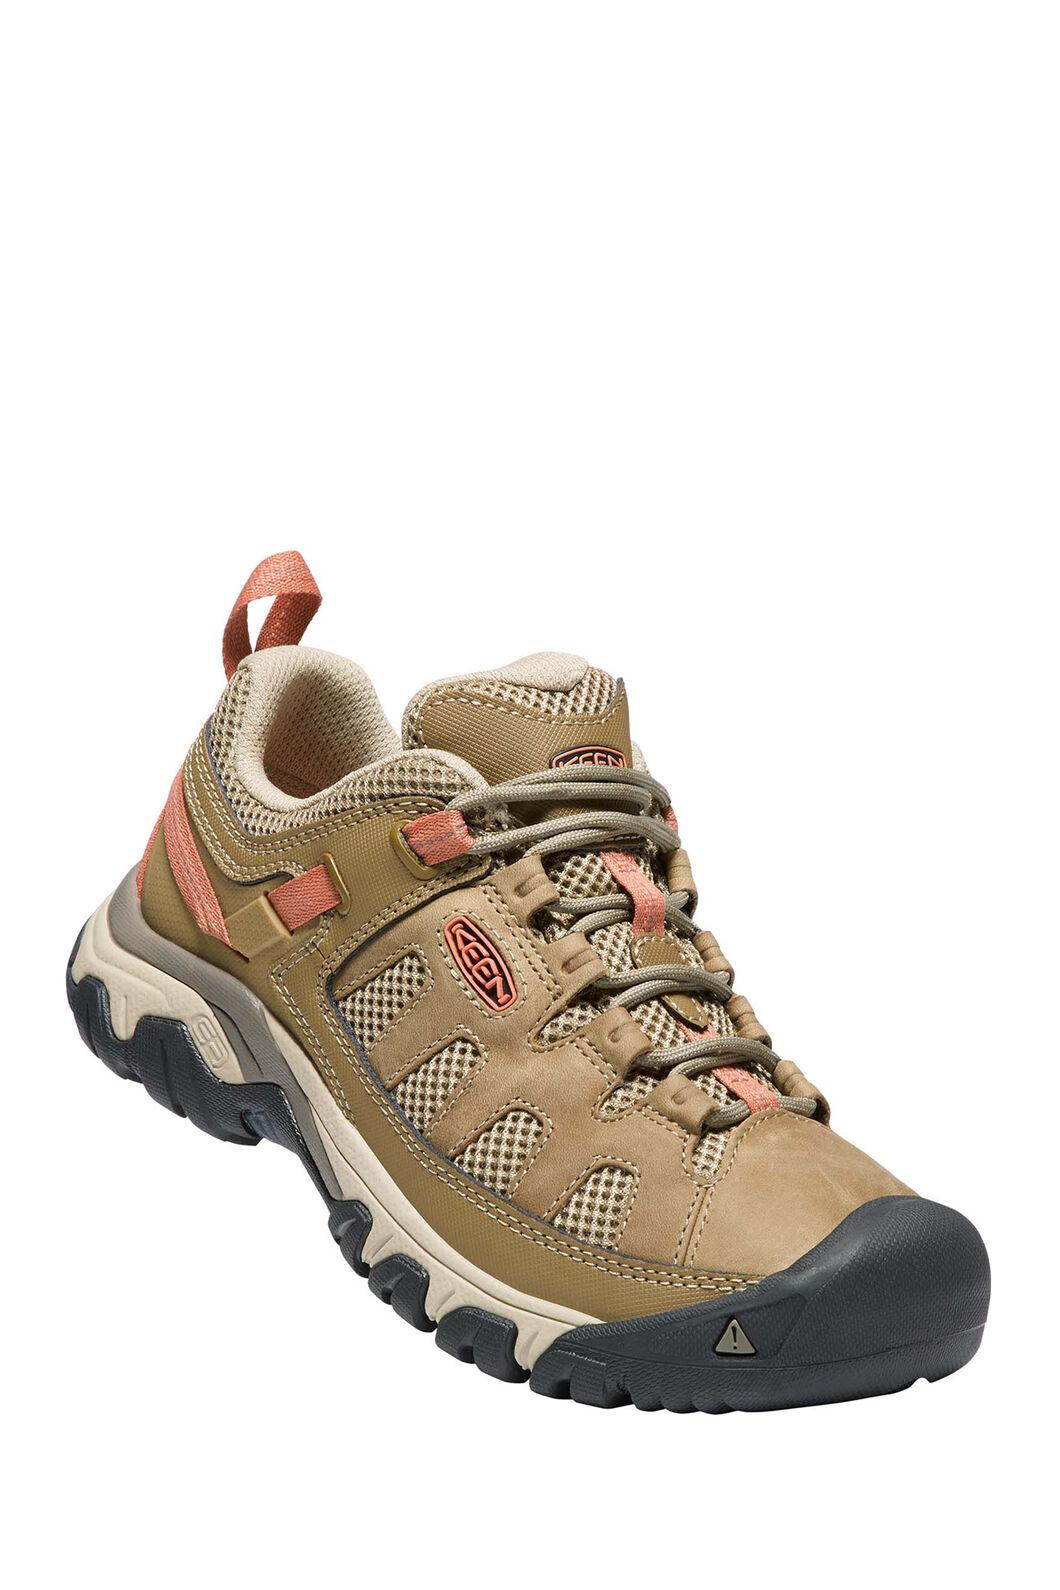 KEEN Targhee Vent Hiking Shoes — Women's, Sandy Cornstalk, hi-res